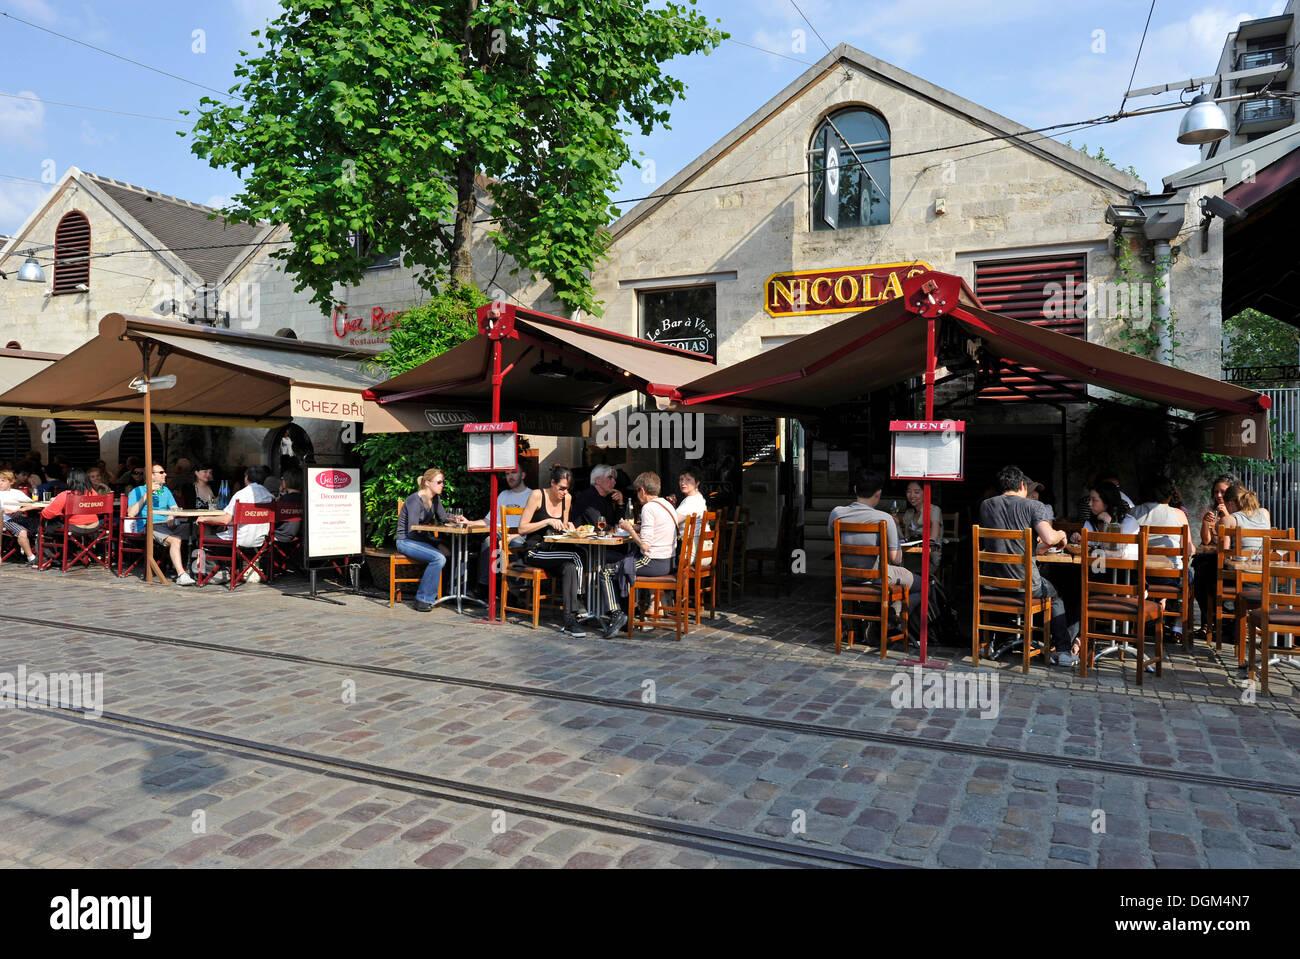 sidewalk caf or street caf brasserie bercy village cour st stock photo royalty free image. Black Bedroom Furniture Sets. Home Design Ideas